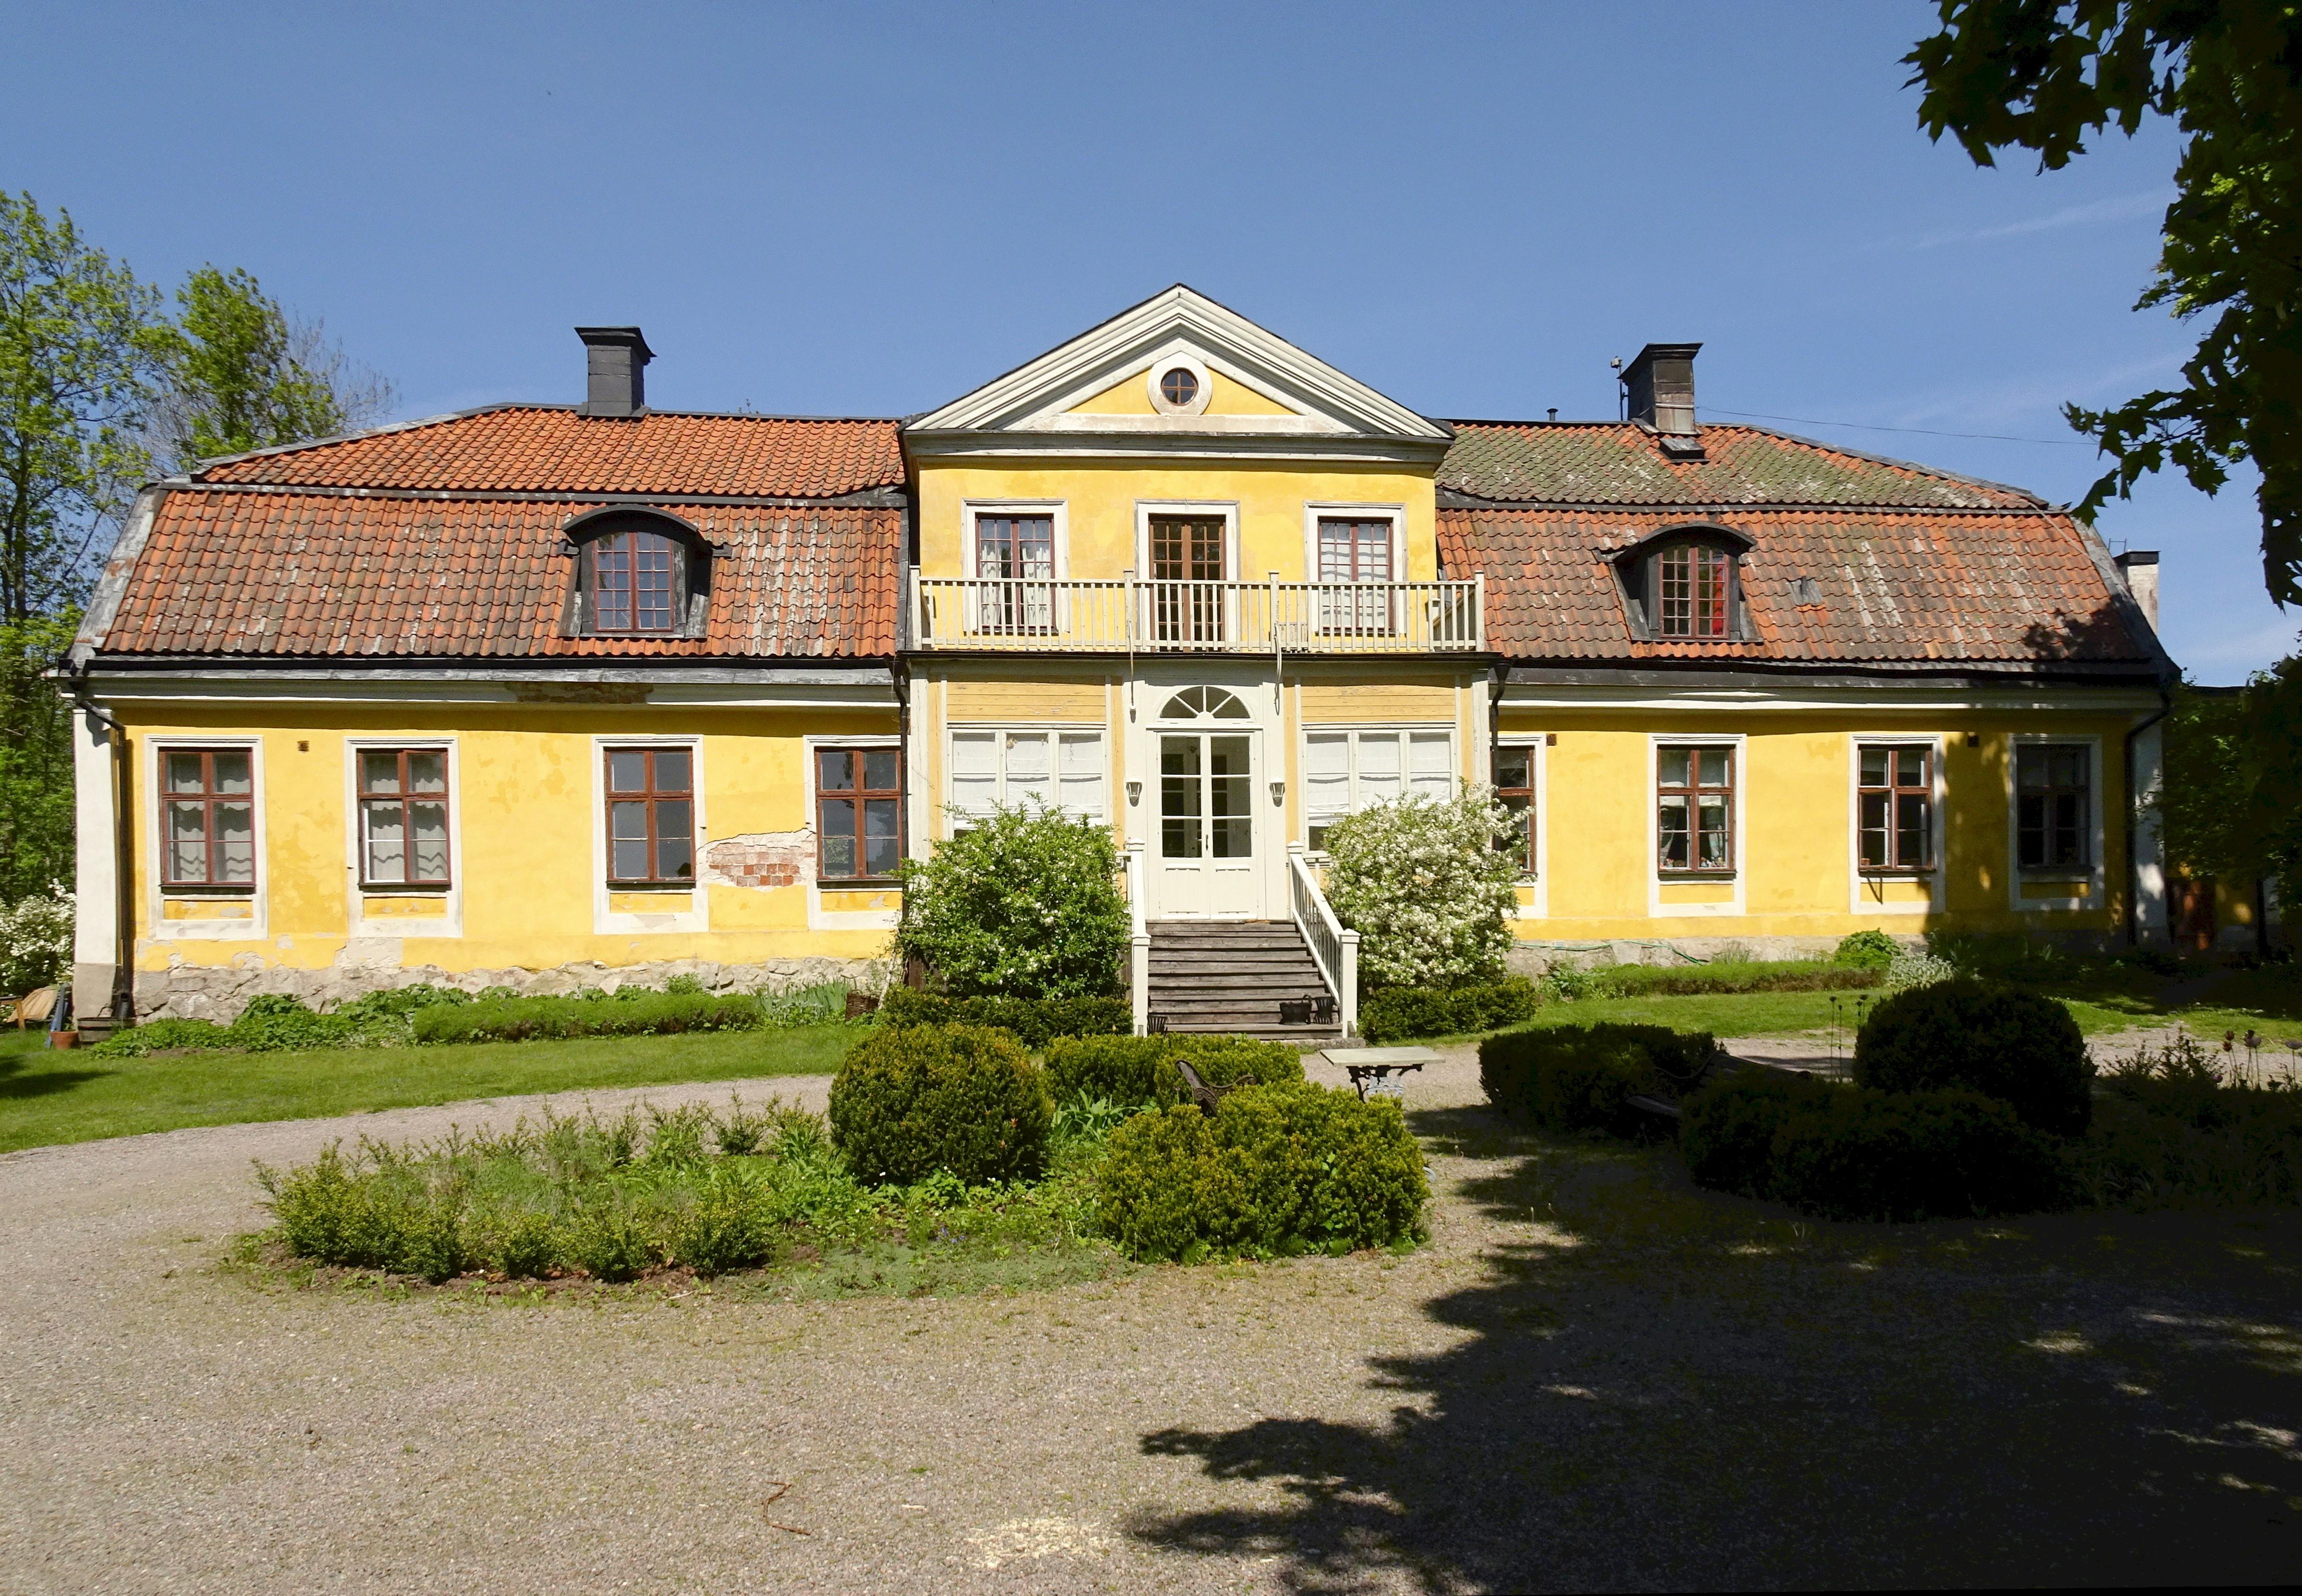 Gamla sockenvgen Flemingsberg Lissma - Wikiwand